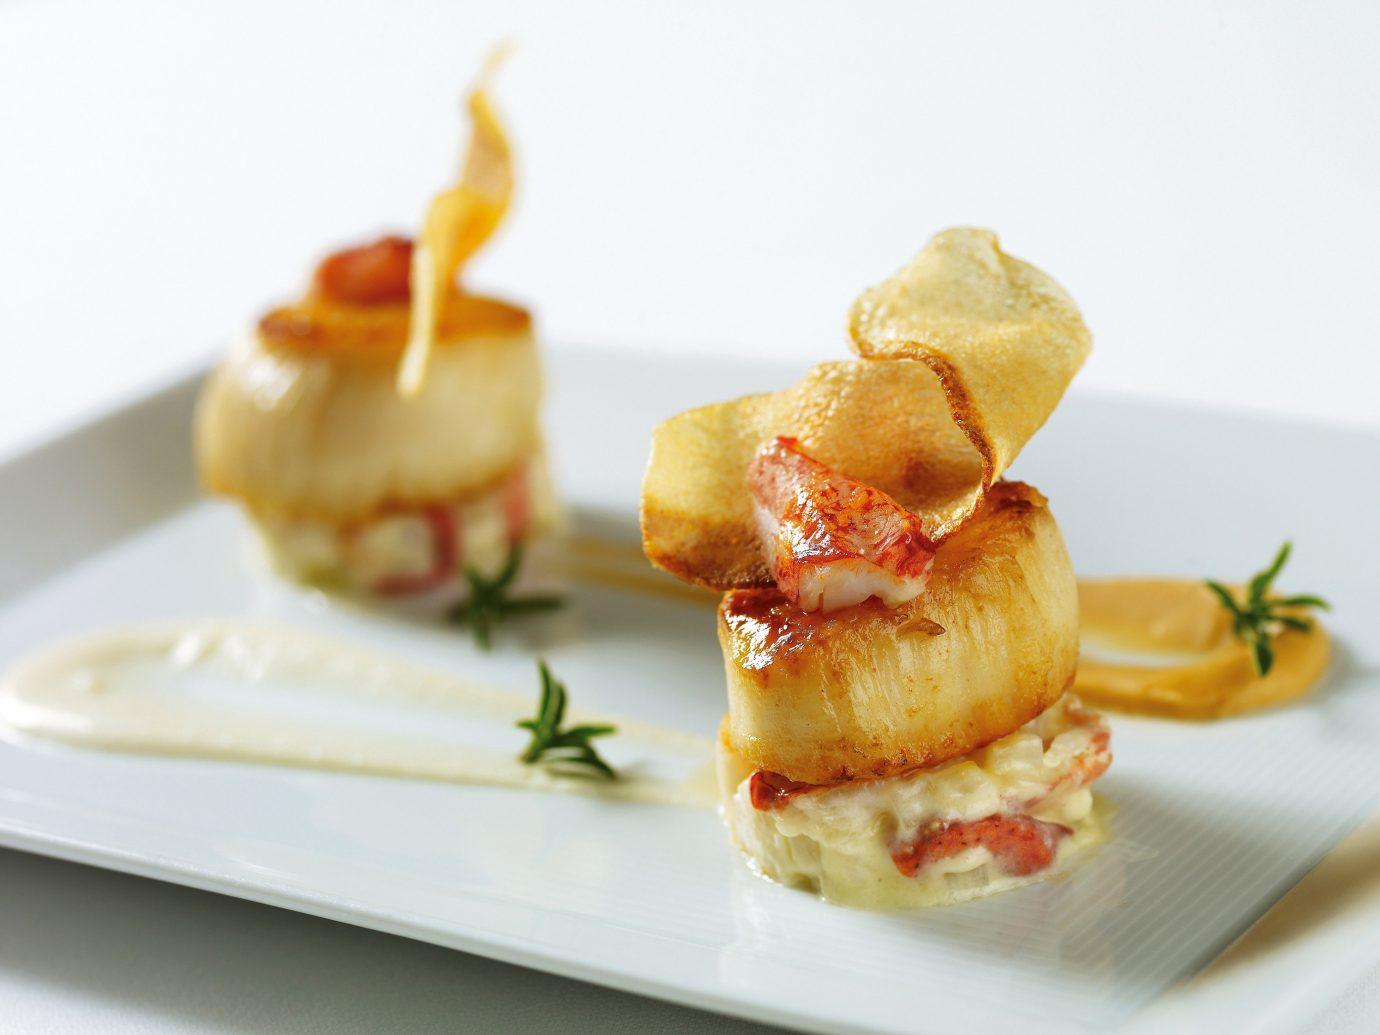 Beach East Coast USA Trip Ideas food dish plate cuisine produce breakfast meal Seafood pincho square